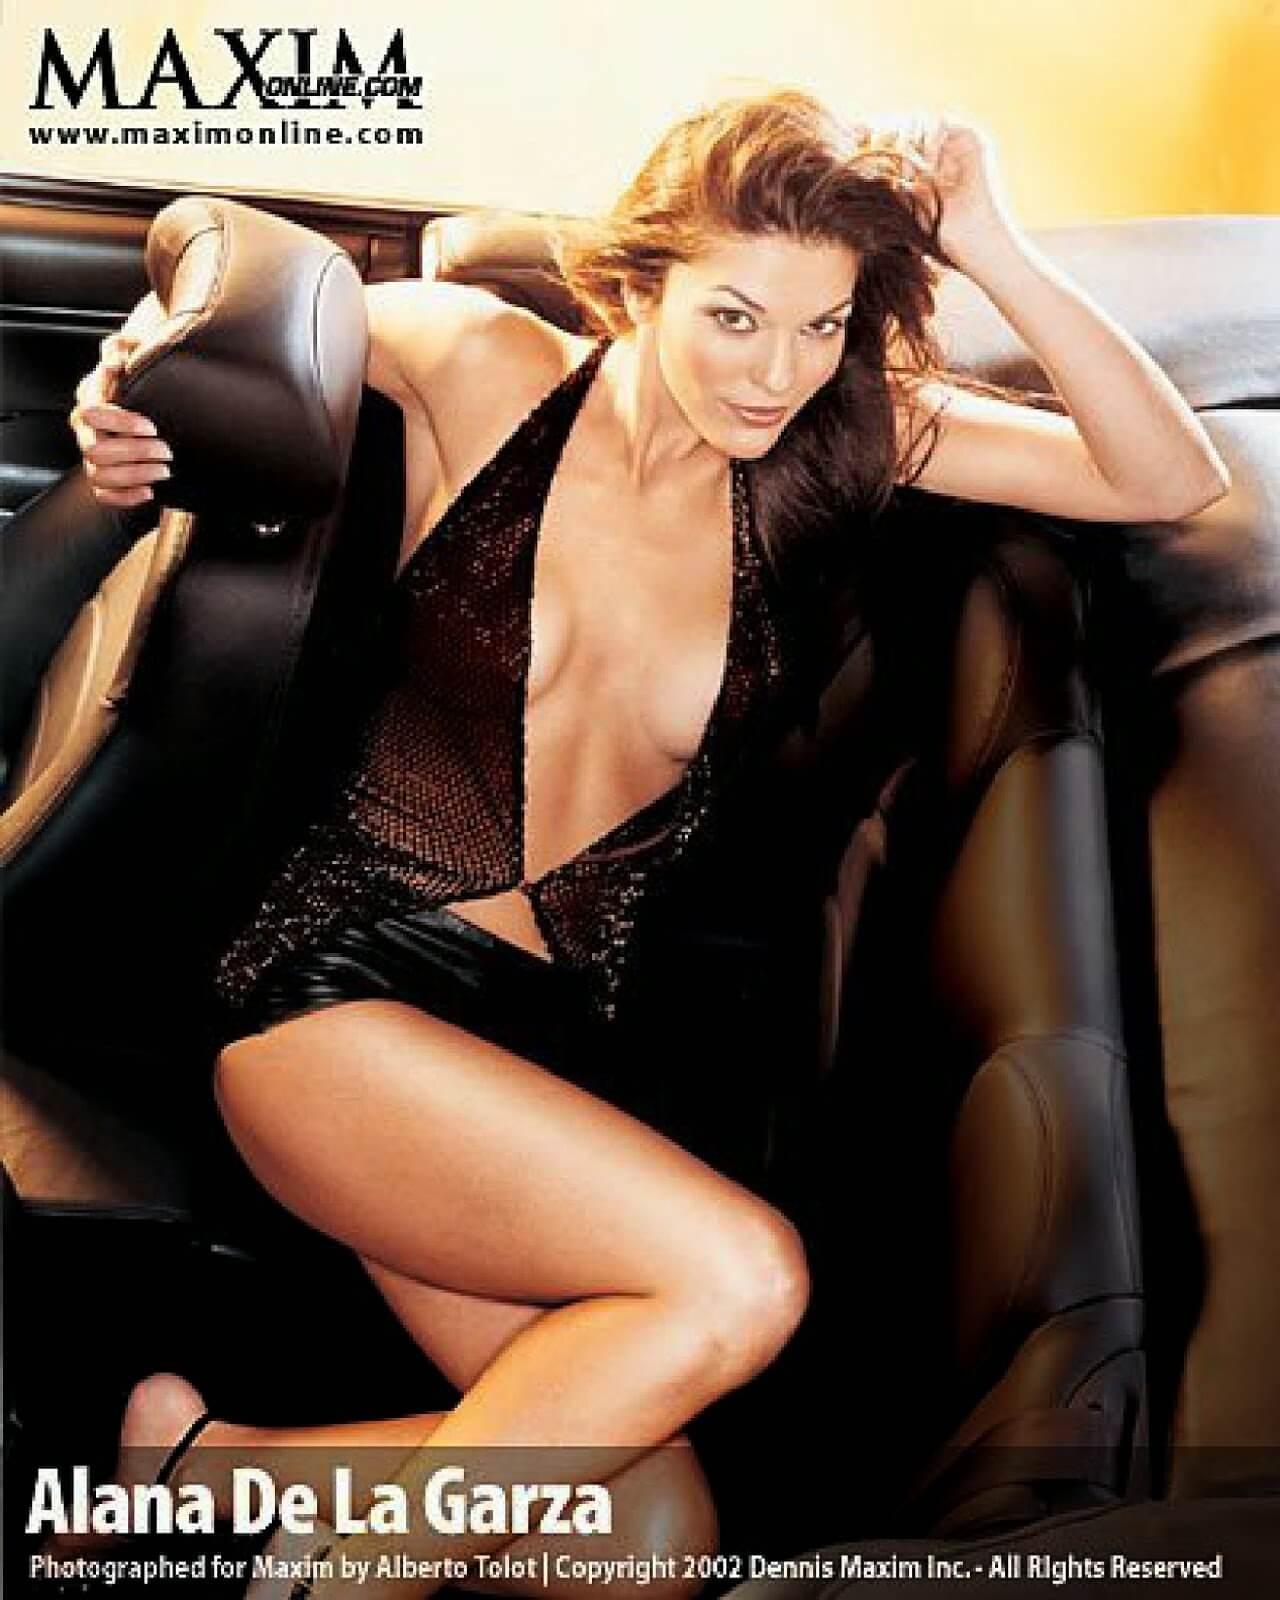 The Hottest Alana de la Garza Photos - 12thBlog